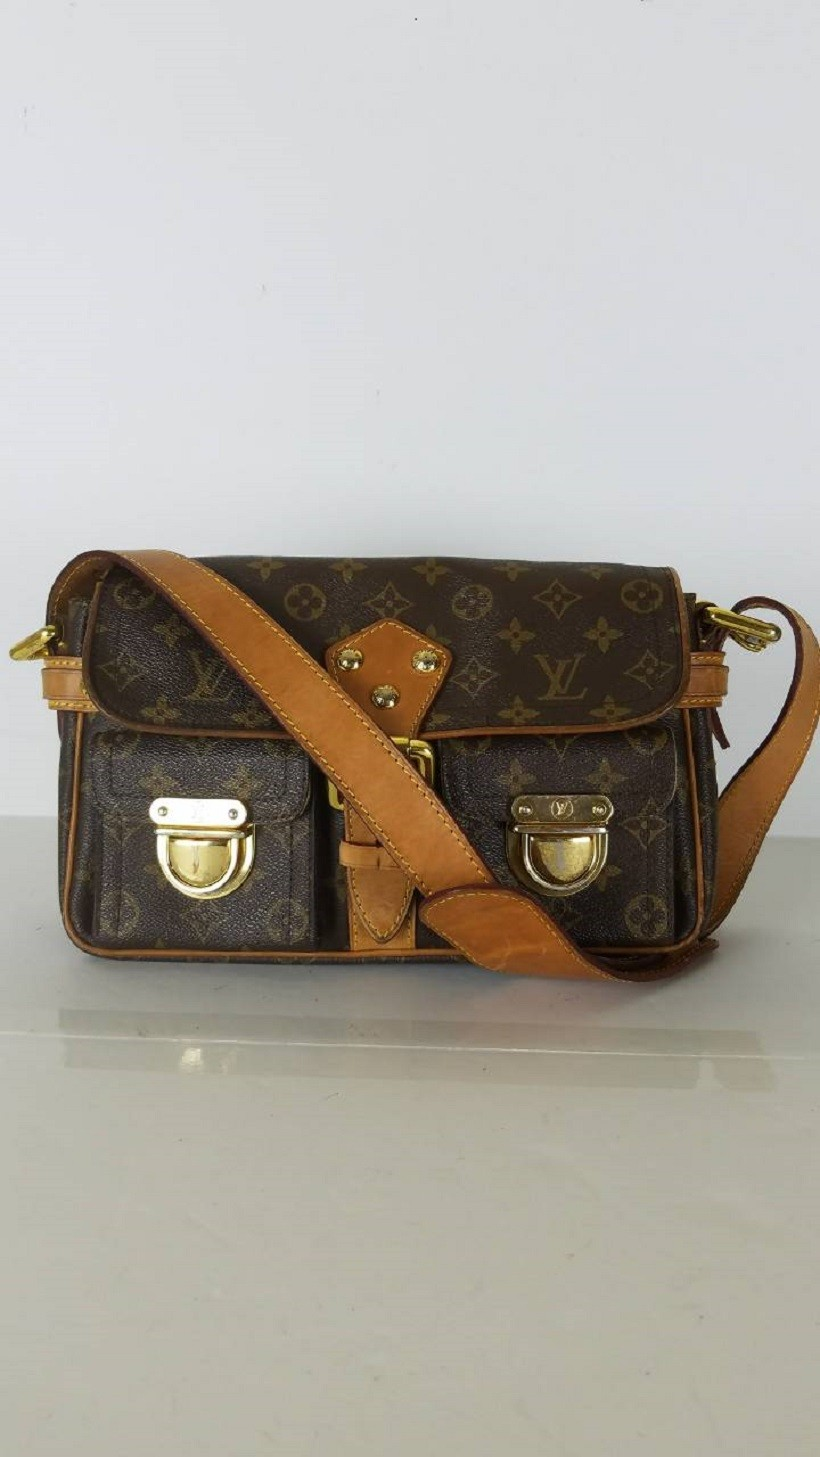 bb3e5767f4 Louis Vuitton Hudson PM Monogram Shoulder Bag. 31. 12345678910